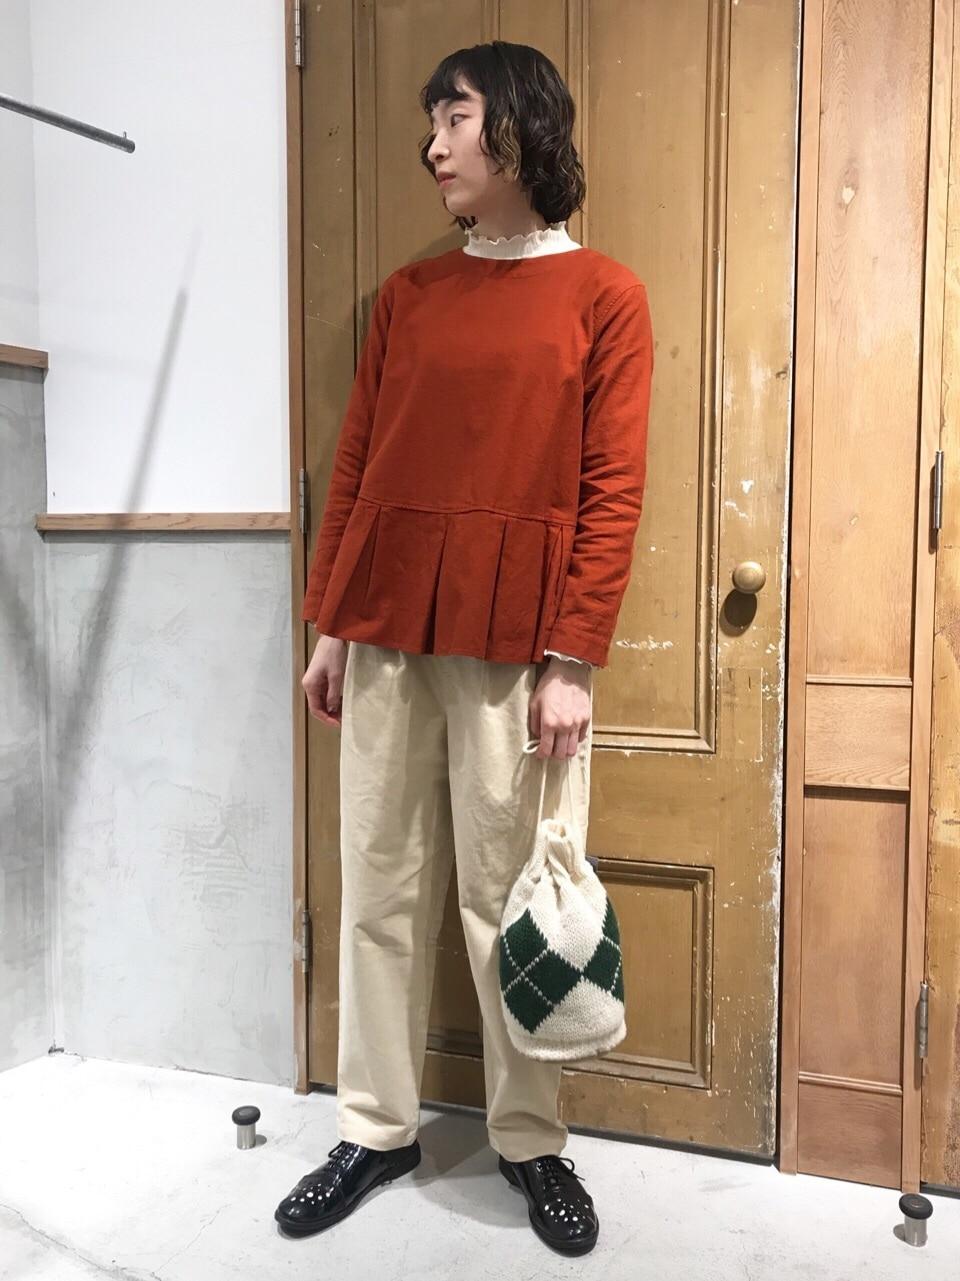 Malle chambre de charme ルミネ新宿 身長:164cm 2020.12.01